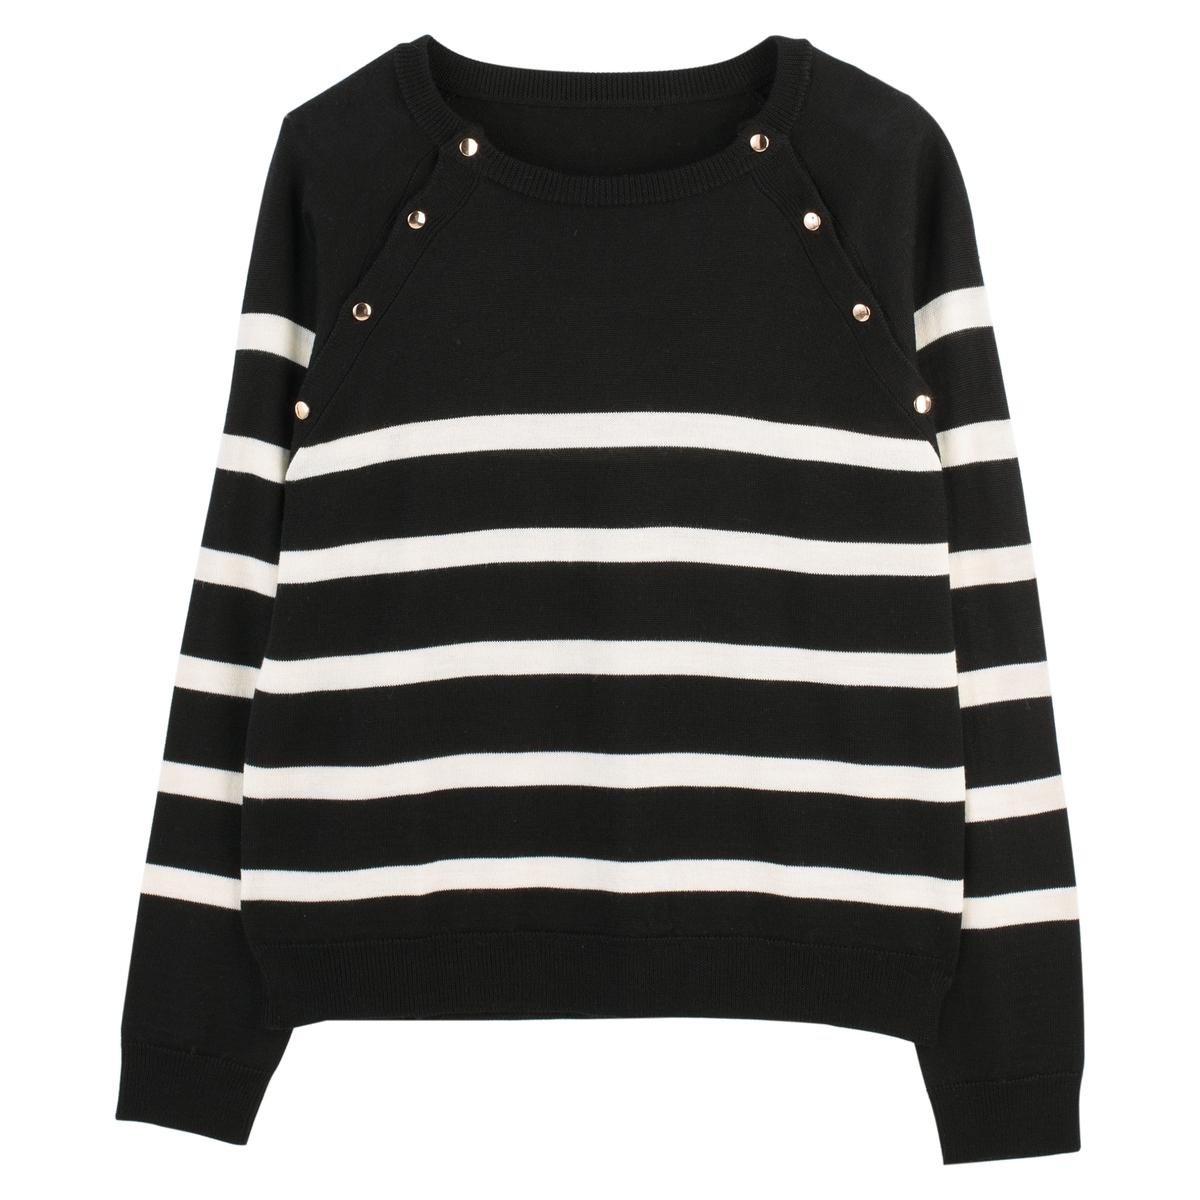 Jersey de estilo marinero abotonado, corte amplio